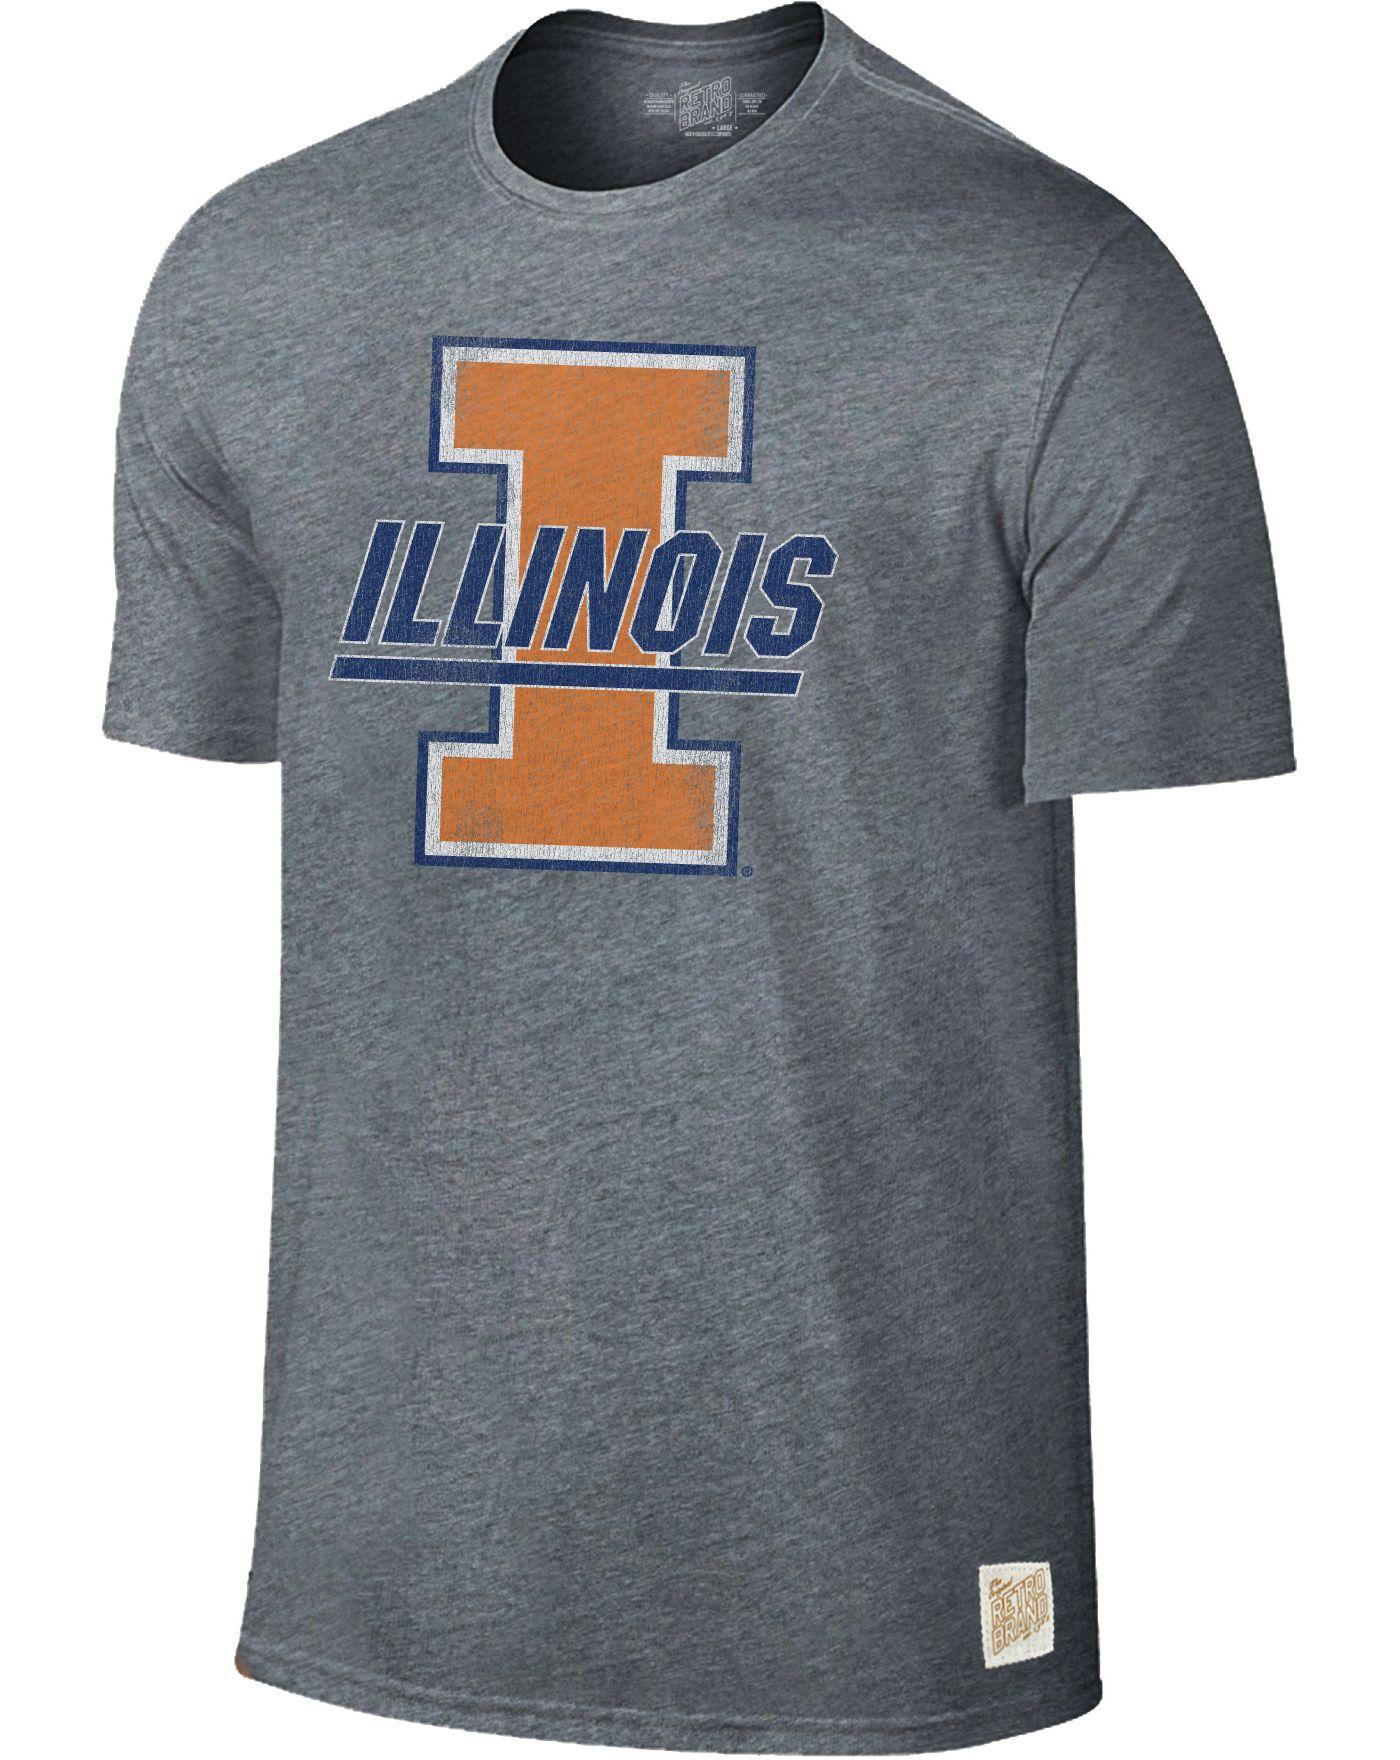 Original Retro Brand Men's Illinois Fighting Illini Grey Retro Tri-Blend T-Shirt